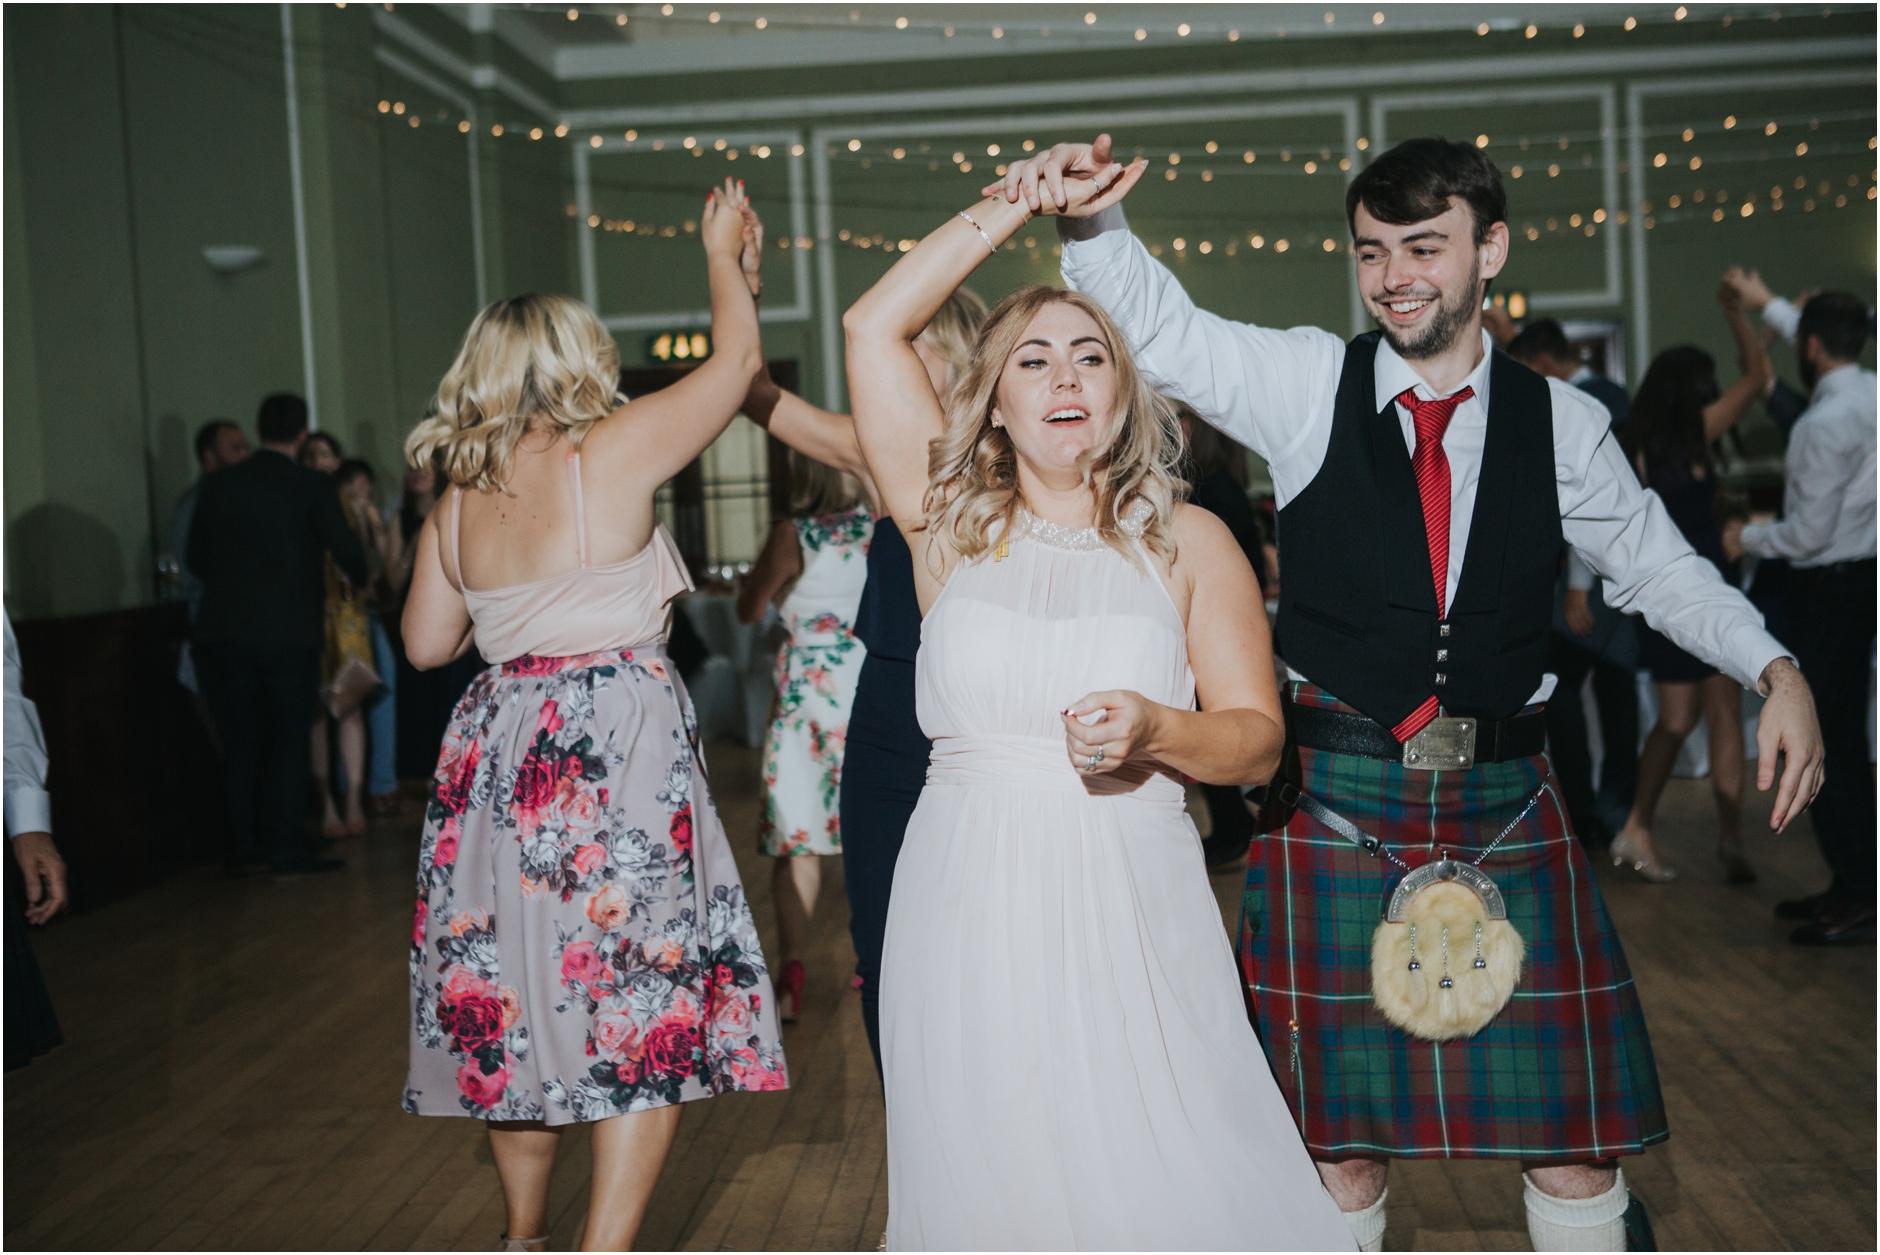 ceilidh wedding thomas morton hall edinburgh